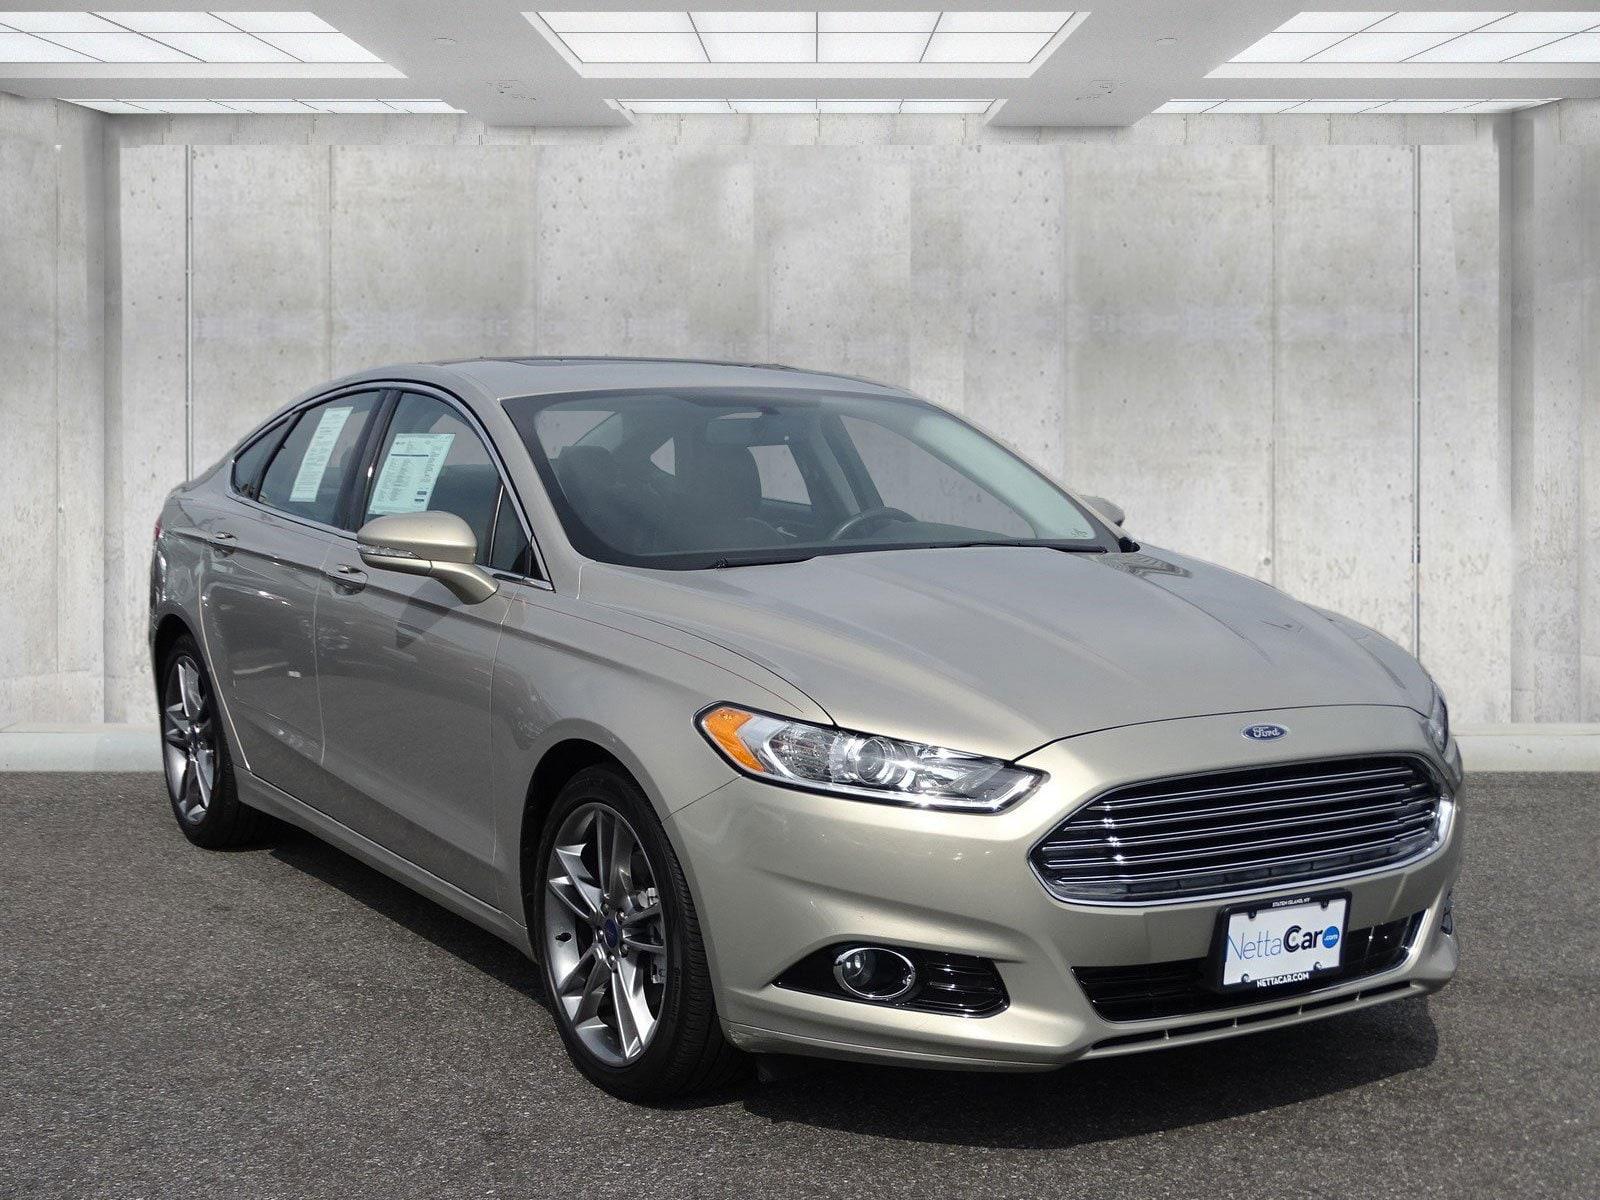 2015 Ford Fusion CERTIFIED TITANIUM--EVERY OPTION--17,000 MILES Sedan